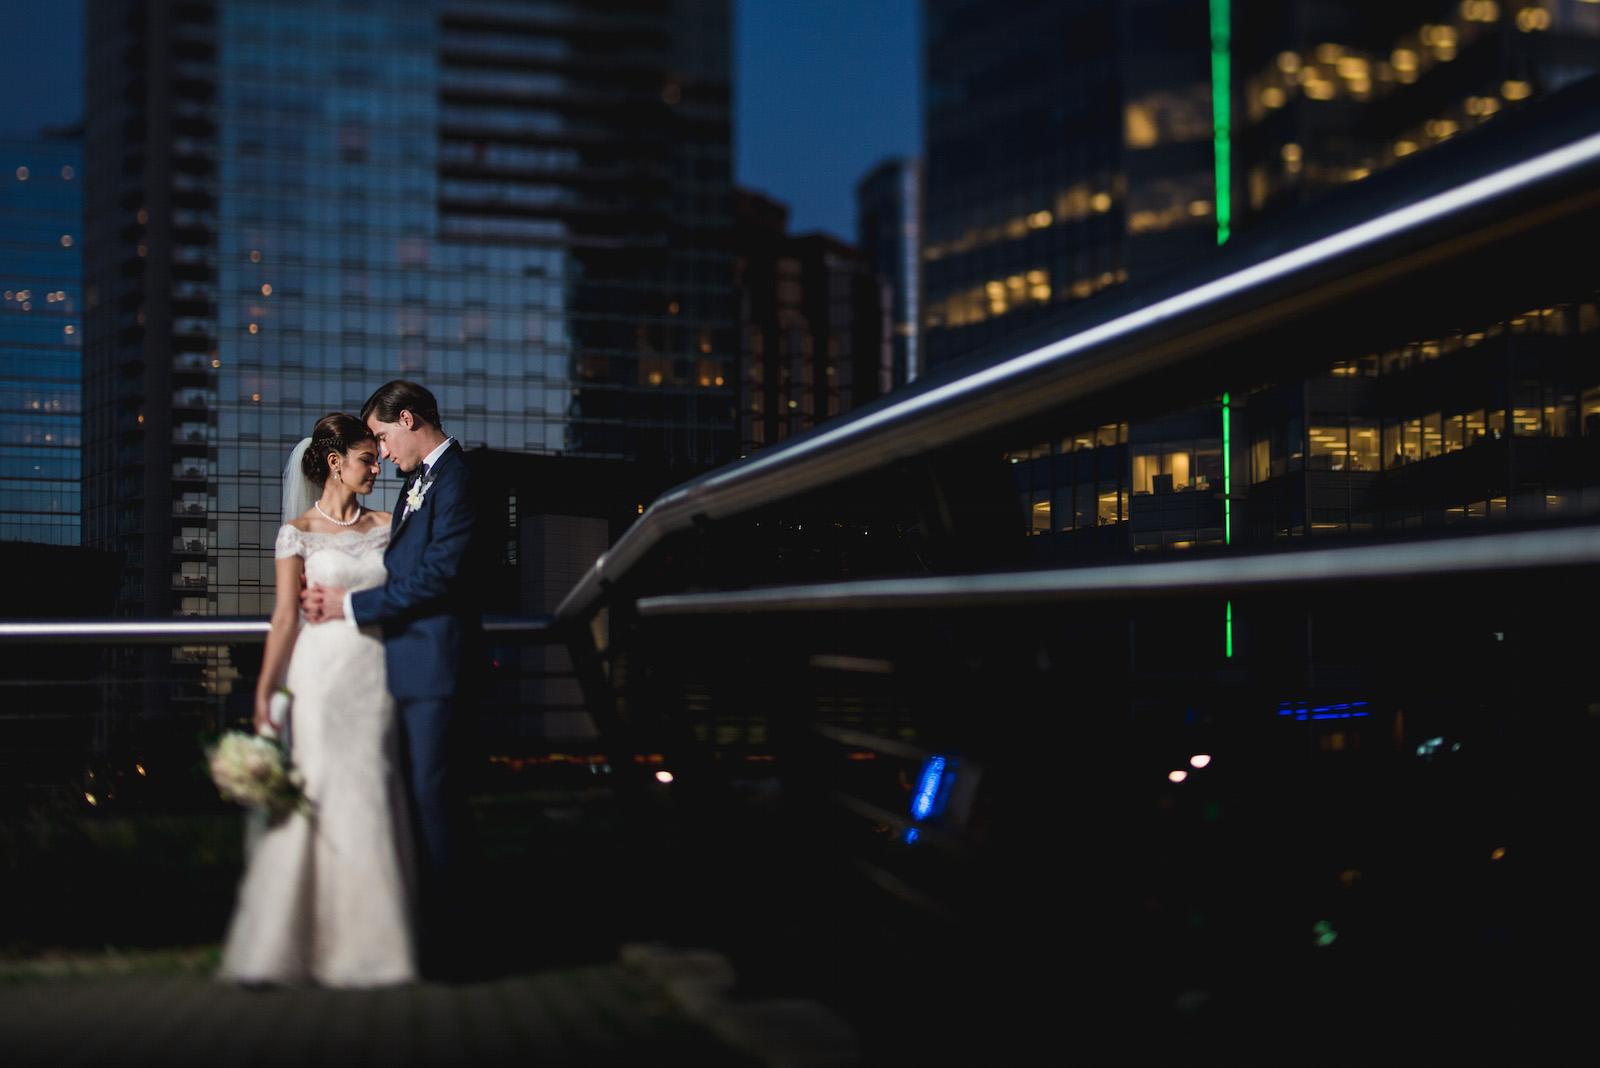 victoria-wedding-photographers-fairmont-pacific-rim-wedding-60.jpg